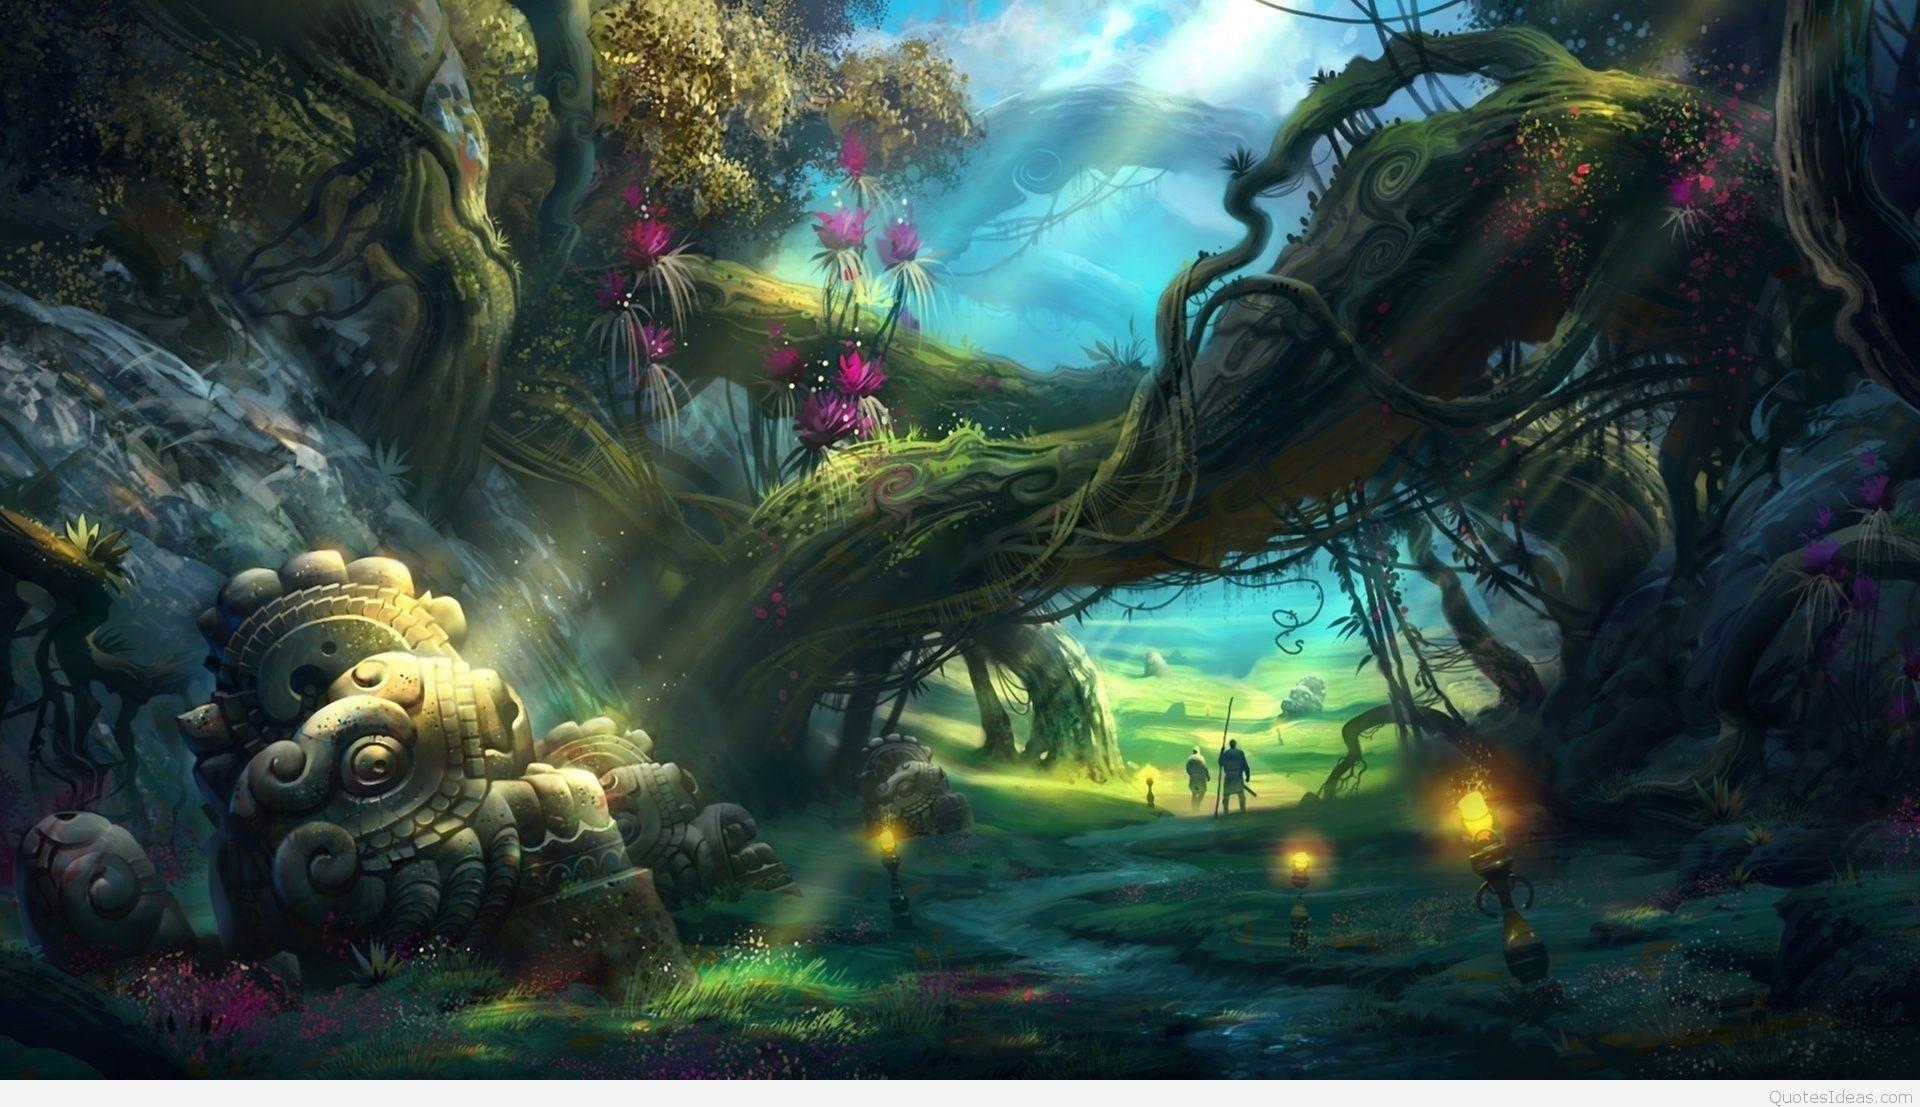 Fantasy-Forest-Wallpaper-5-42837-Cool-Screensavers